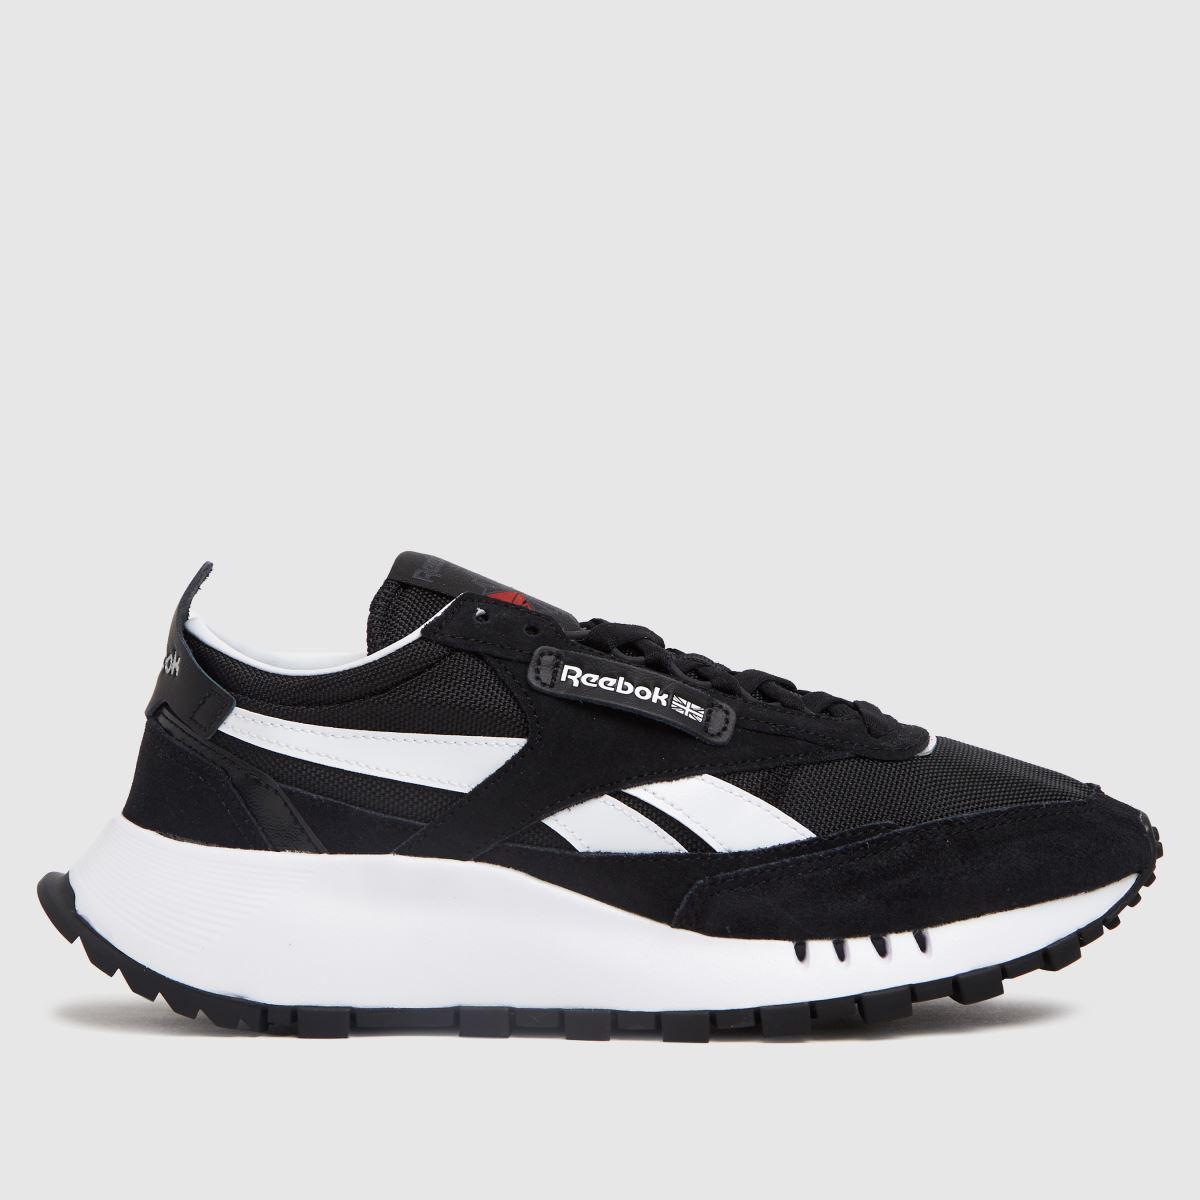 Reebok Black & White Cl Legacy Trainers